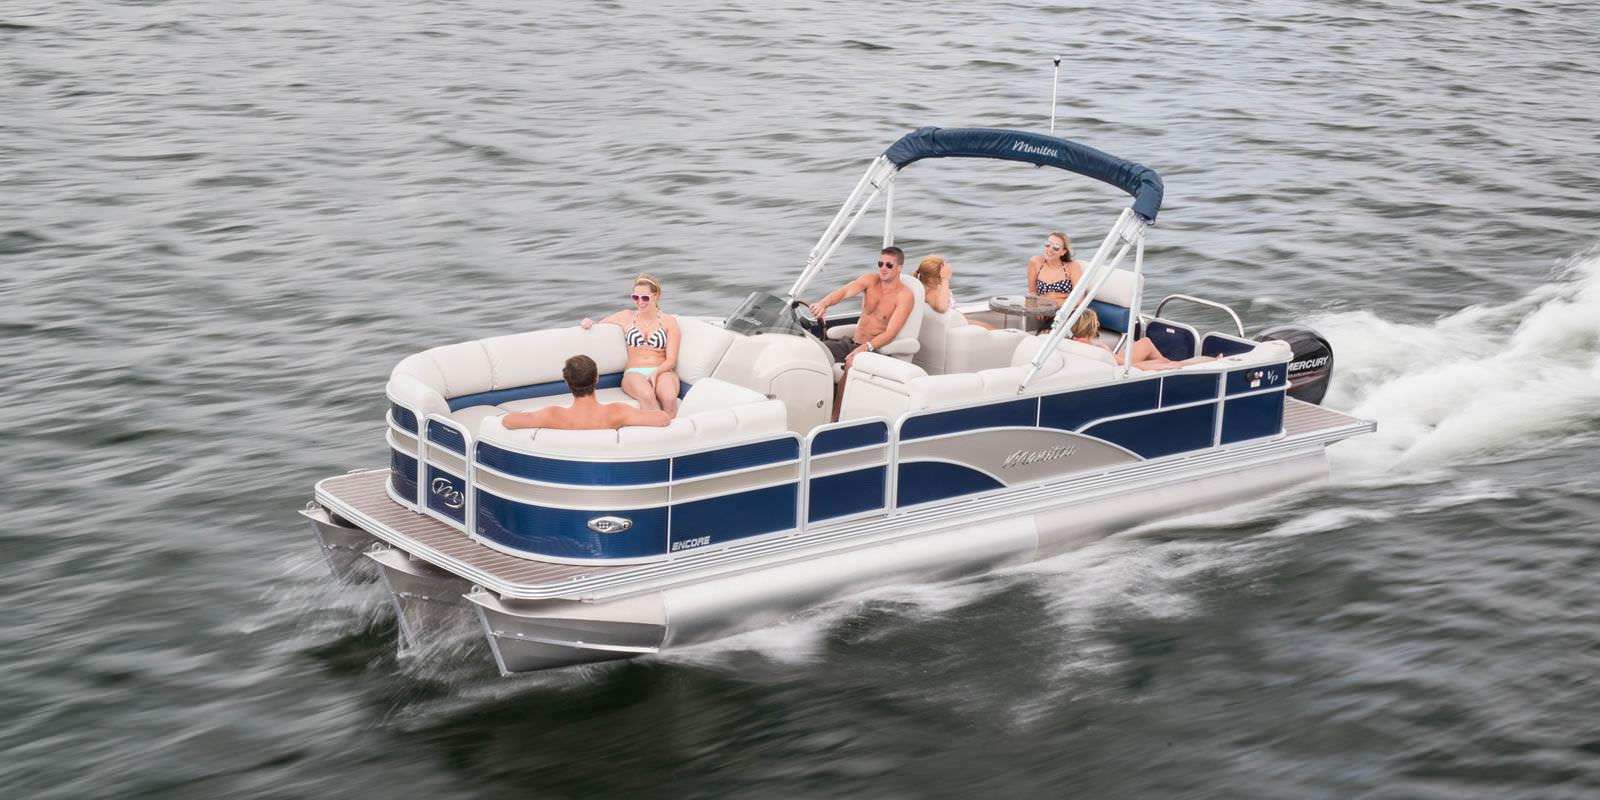 Outboard pontoon boat / tri-tube / 15-person max  - 27